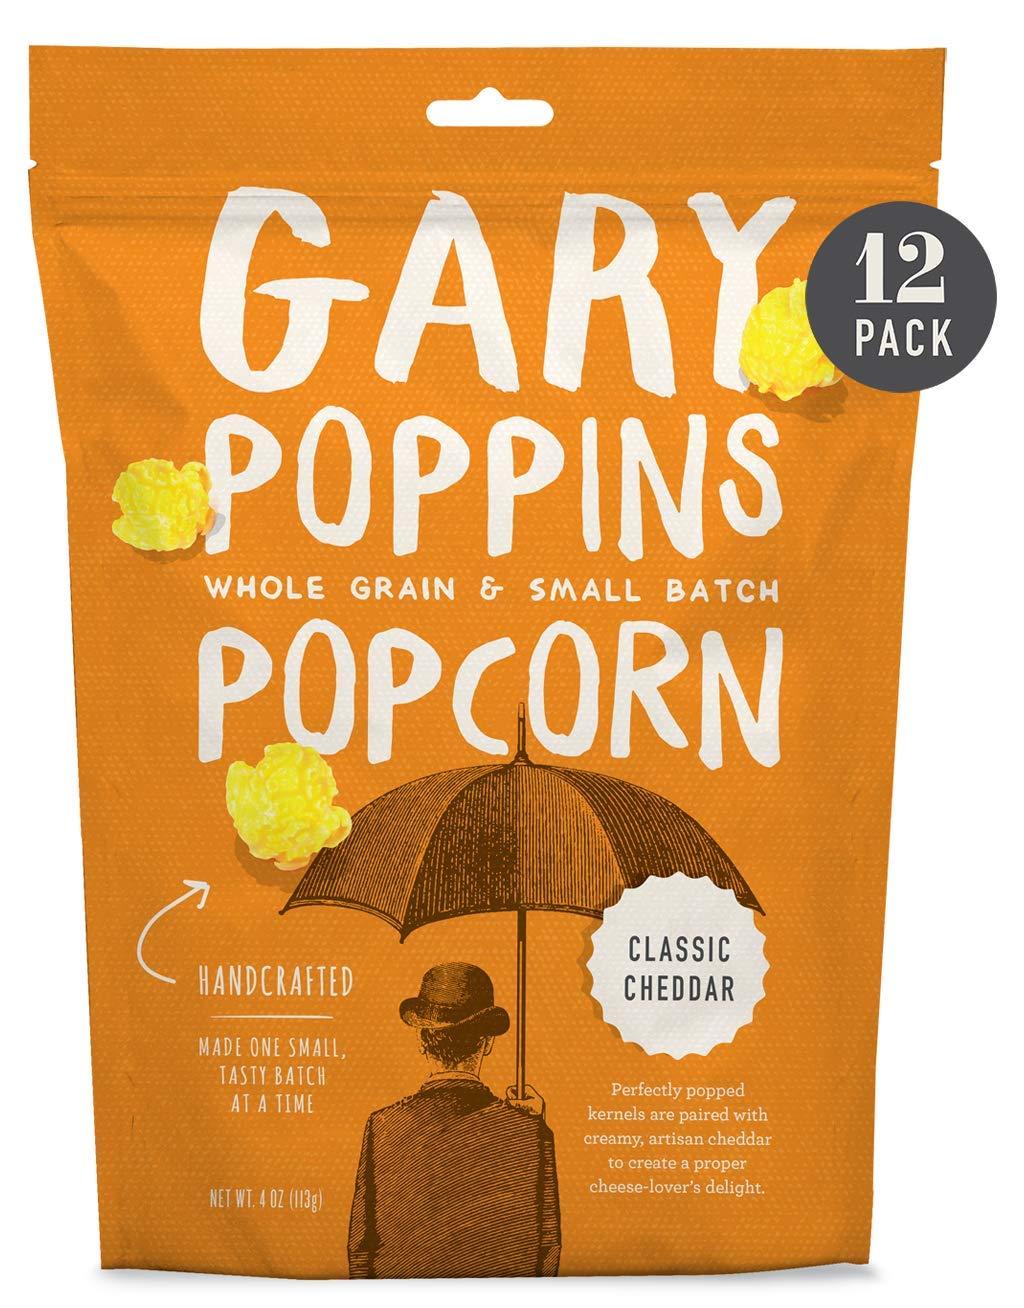 Gary List price Poppins Popcorn - Classic Flavored Virginia Beach Mall Pack 12 4oz Cheddar